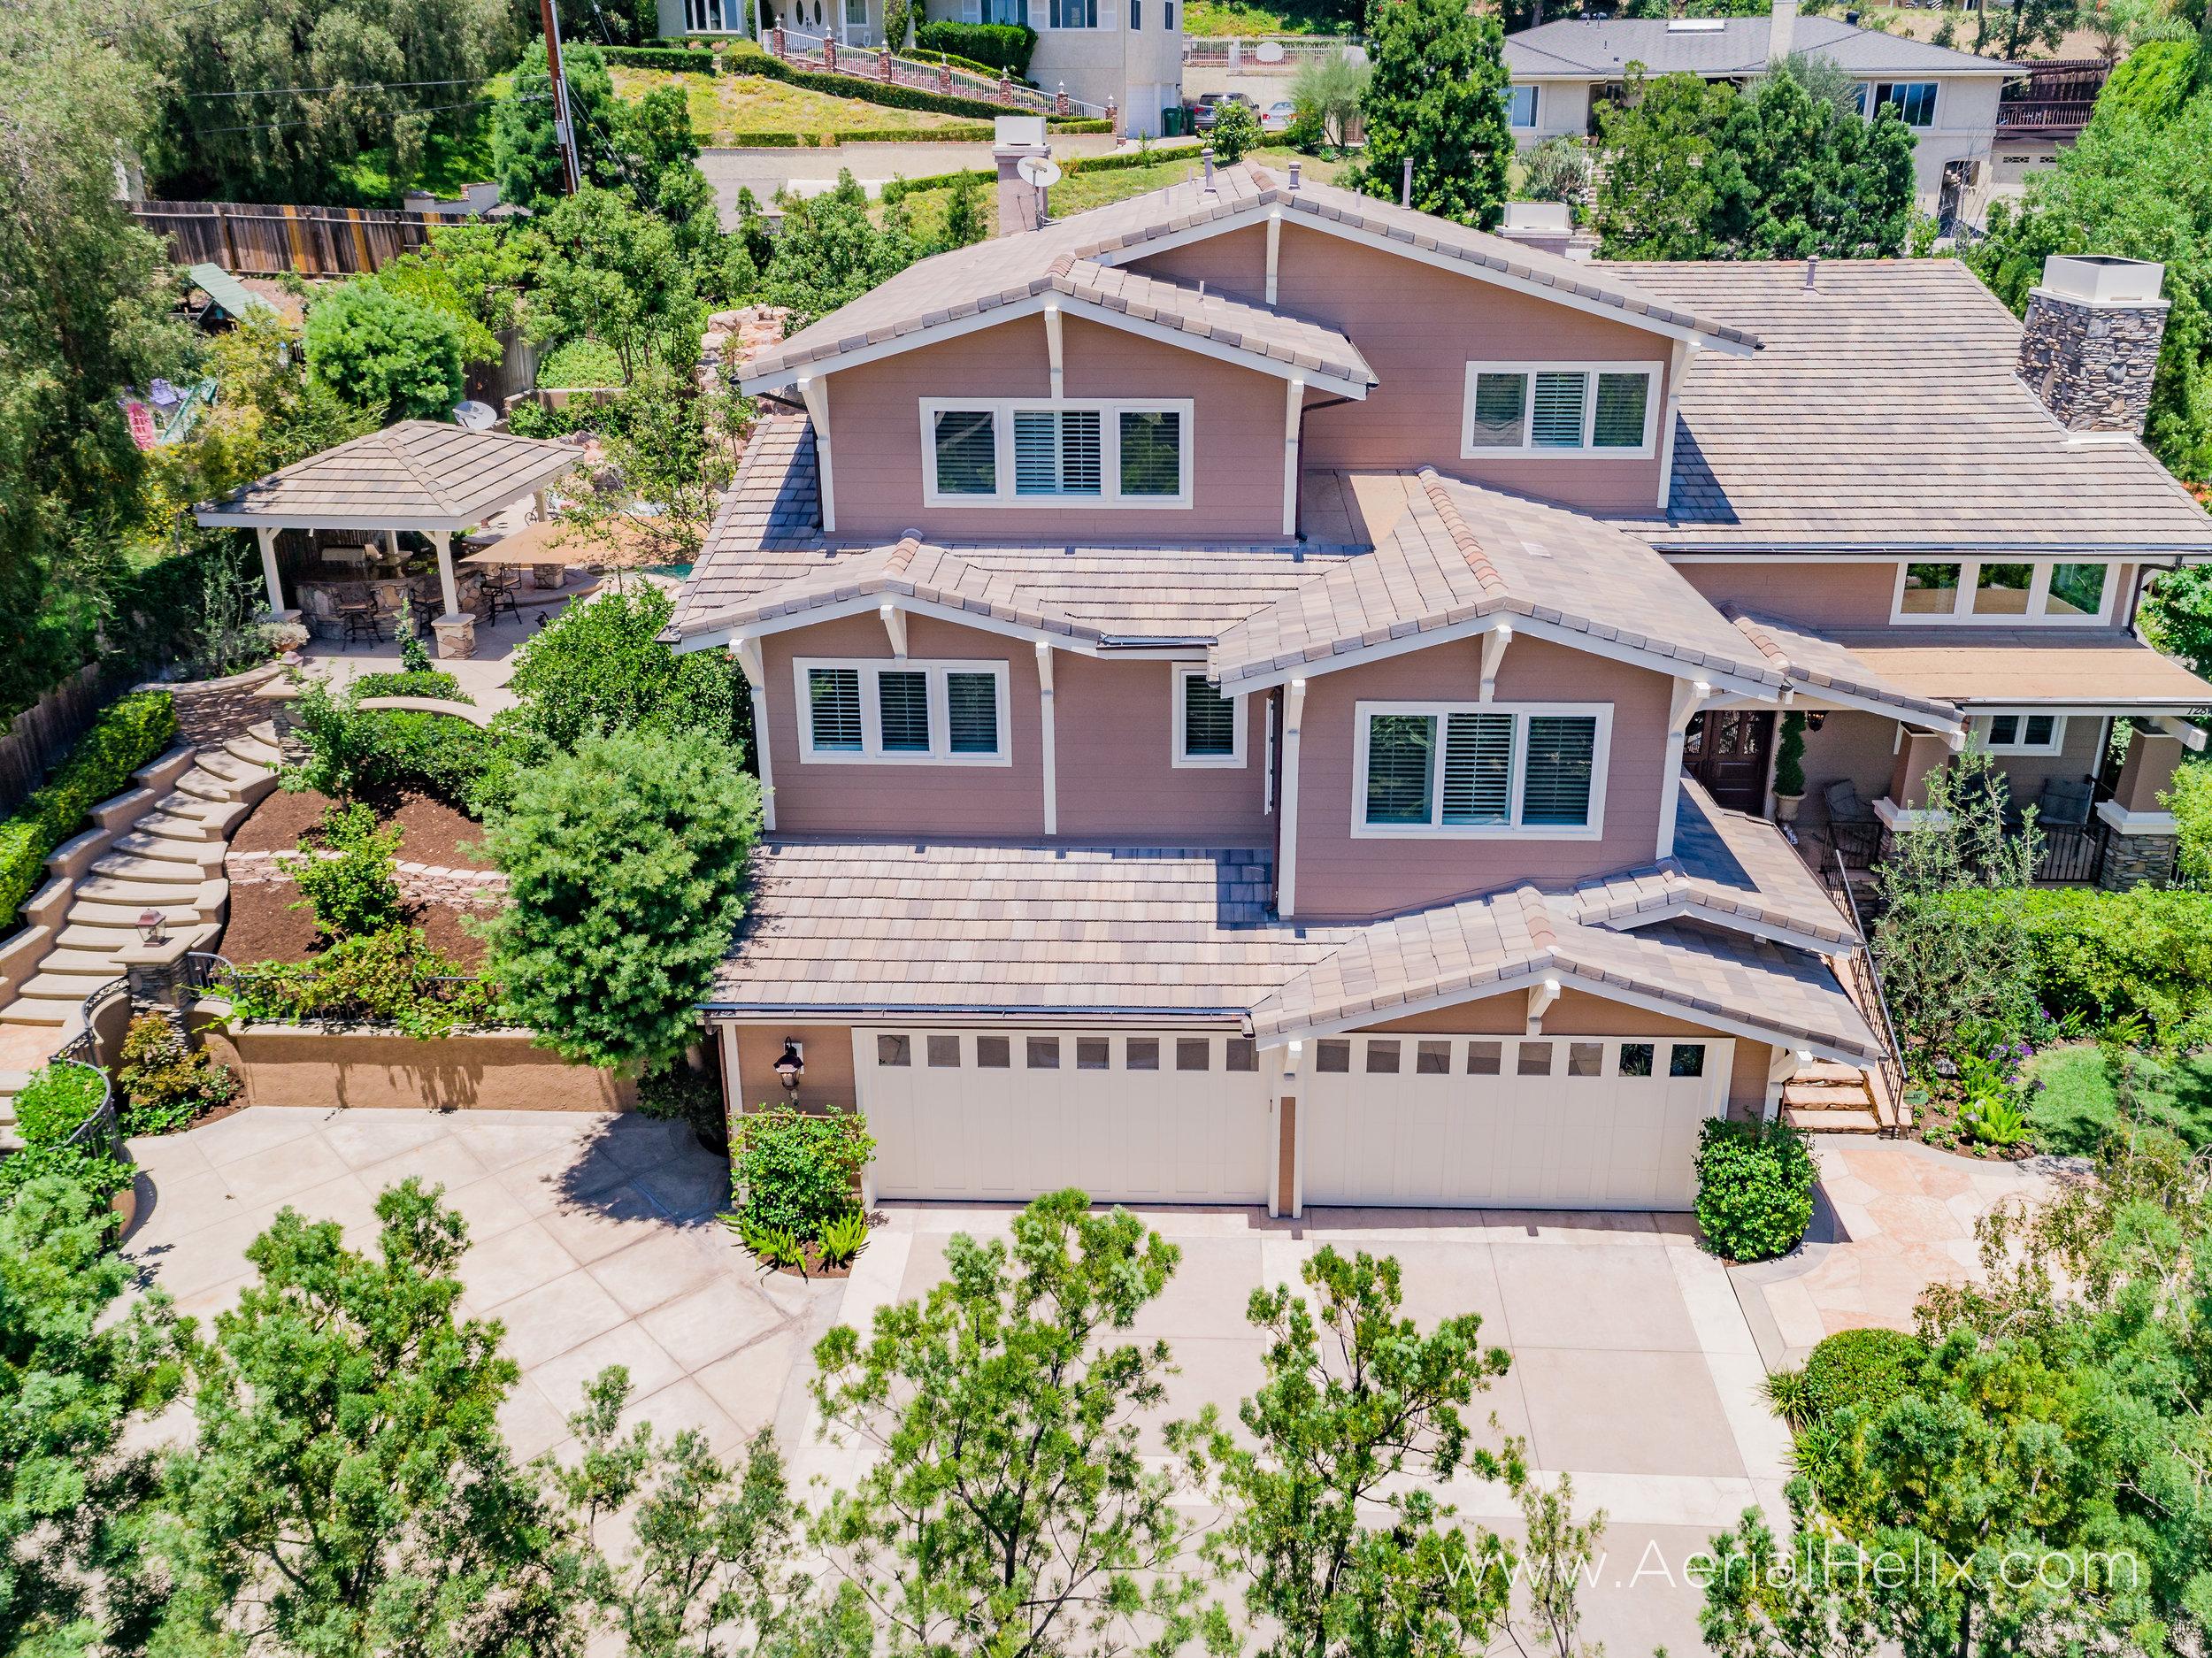 HELIX - Craftsman Lane - Real Estate Drone Photographer-2.jpg